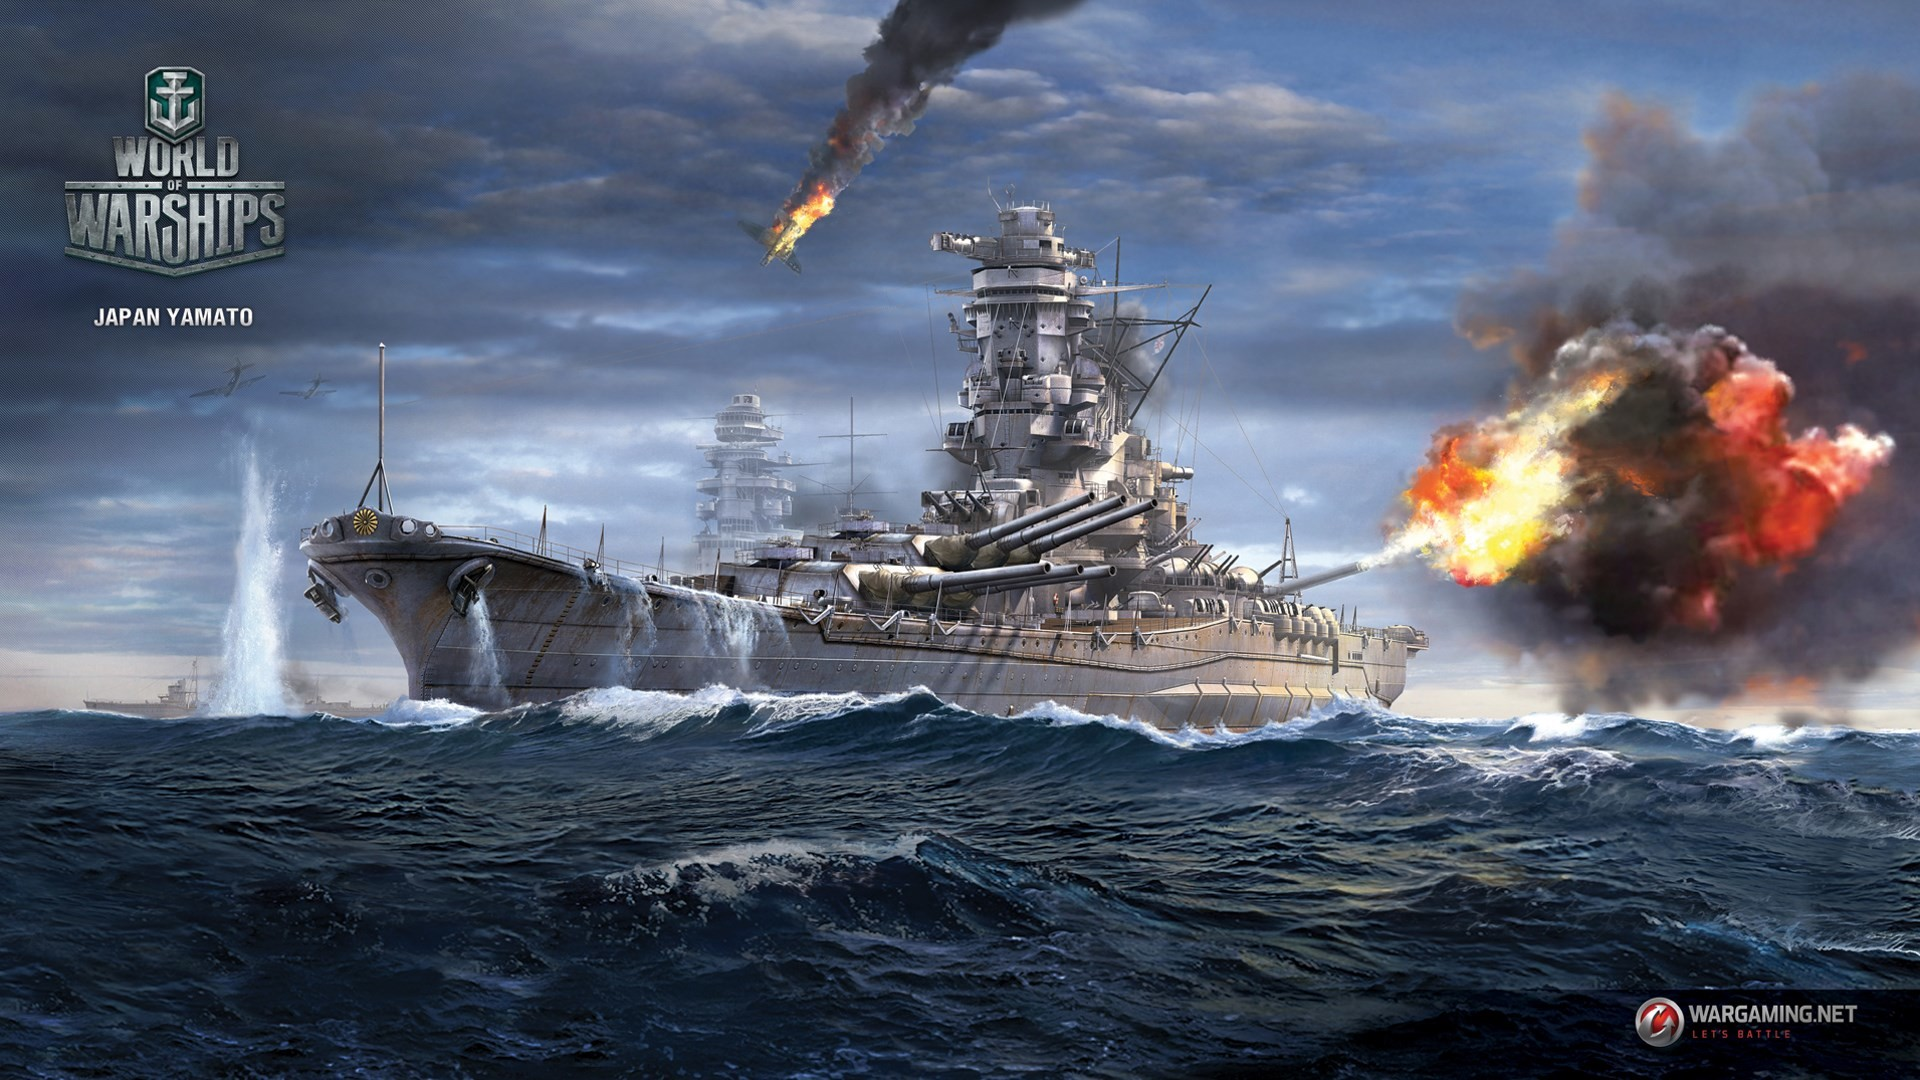 World Of Warships Wallpaper: Yamato Wallpaper (73+ Images